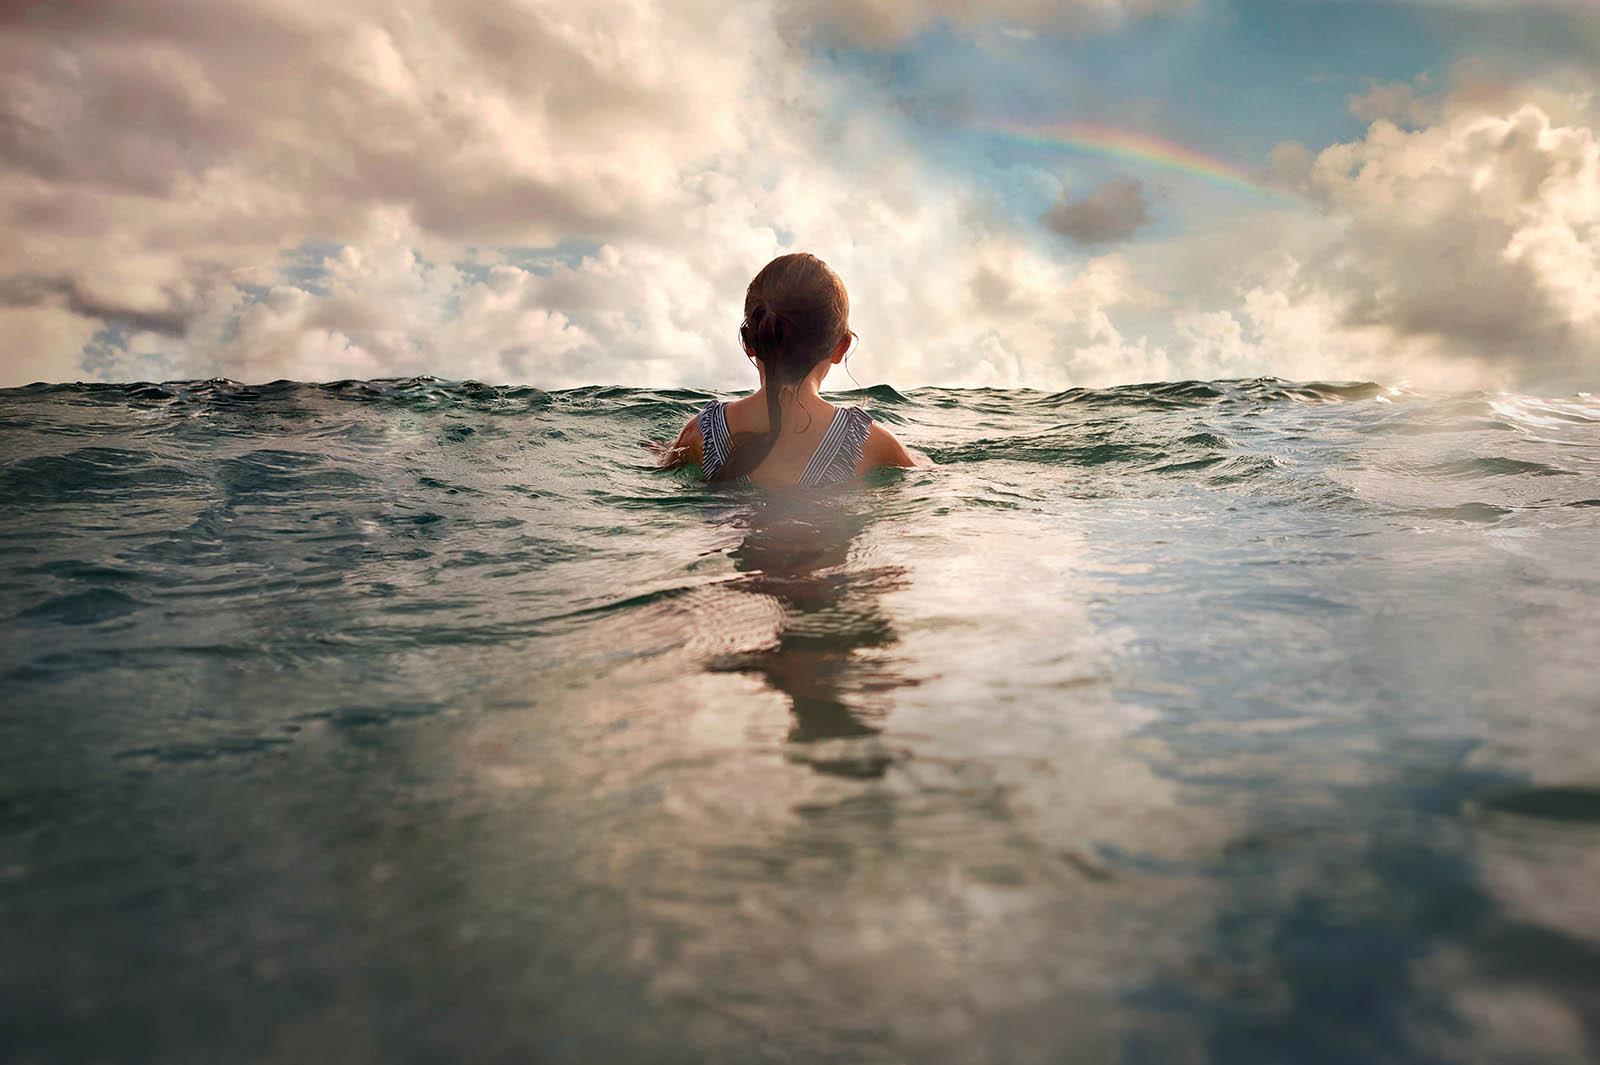 Elizabeth-blank-underwater-photography-07.jpg